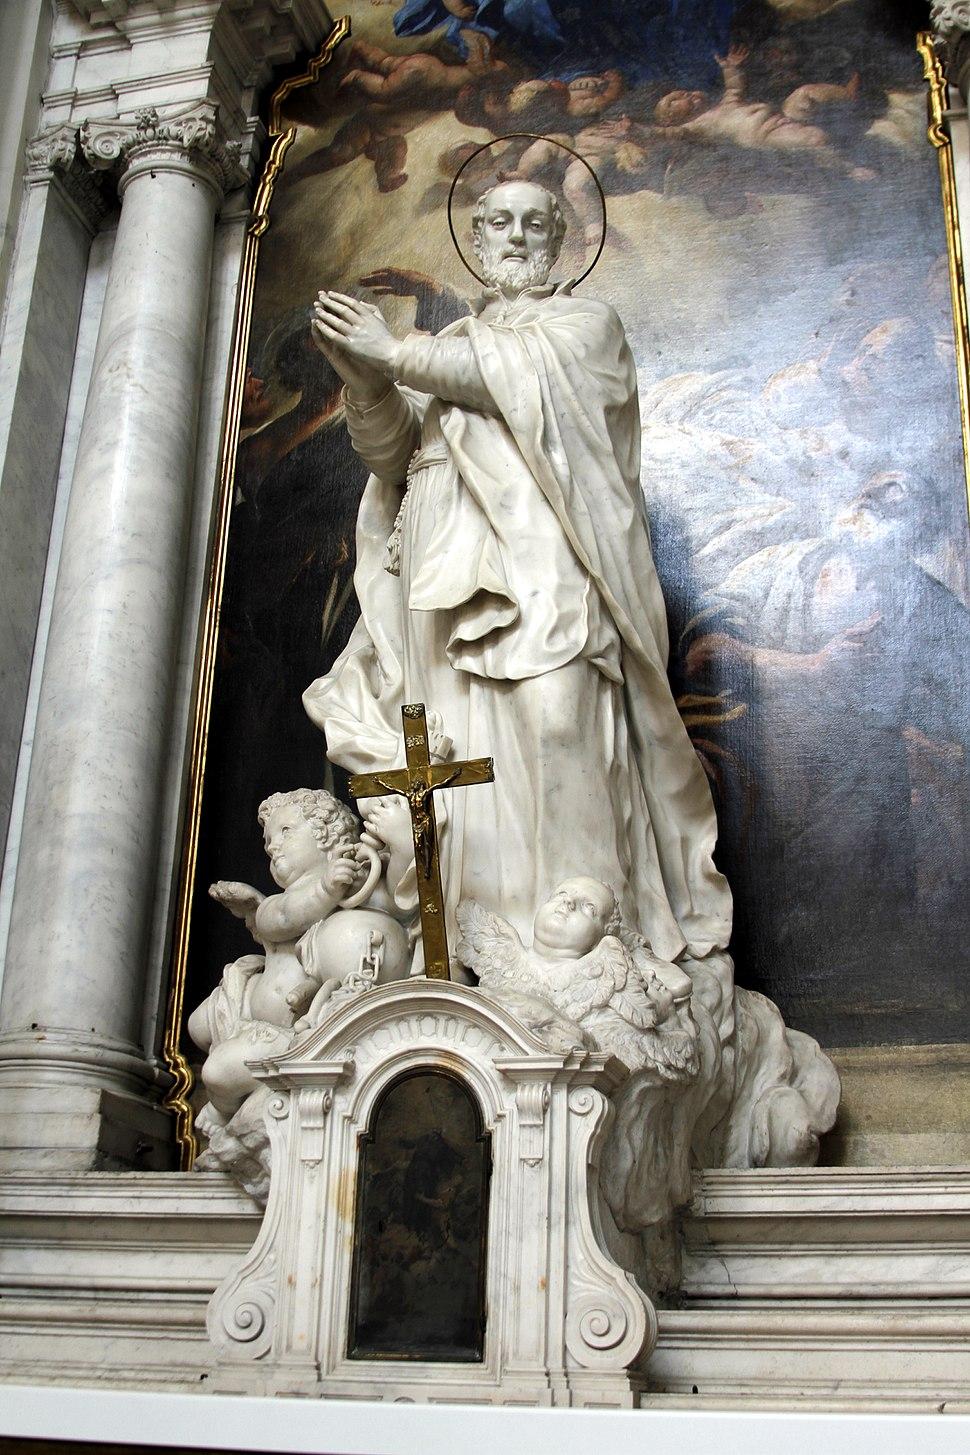 Saint Gerolamo Emiliani (Morleiter, 1767) - Santa Maria della Salute - Venice 2016 (2)